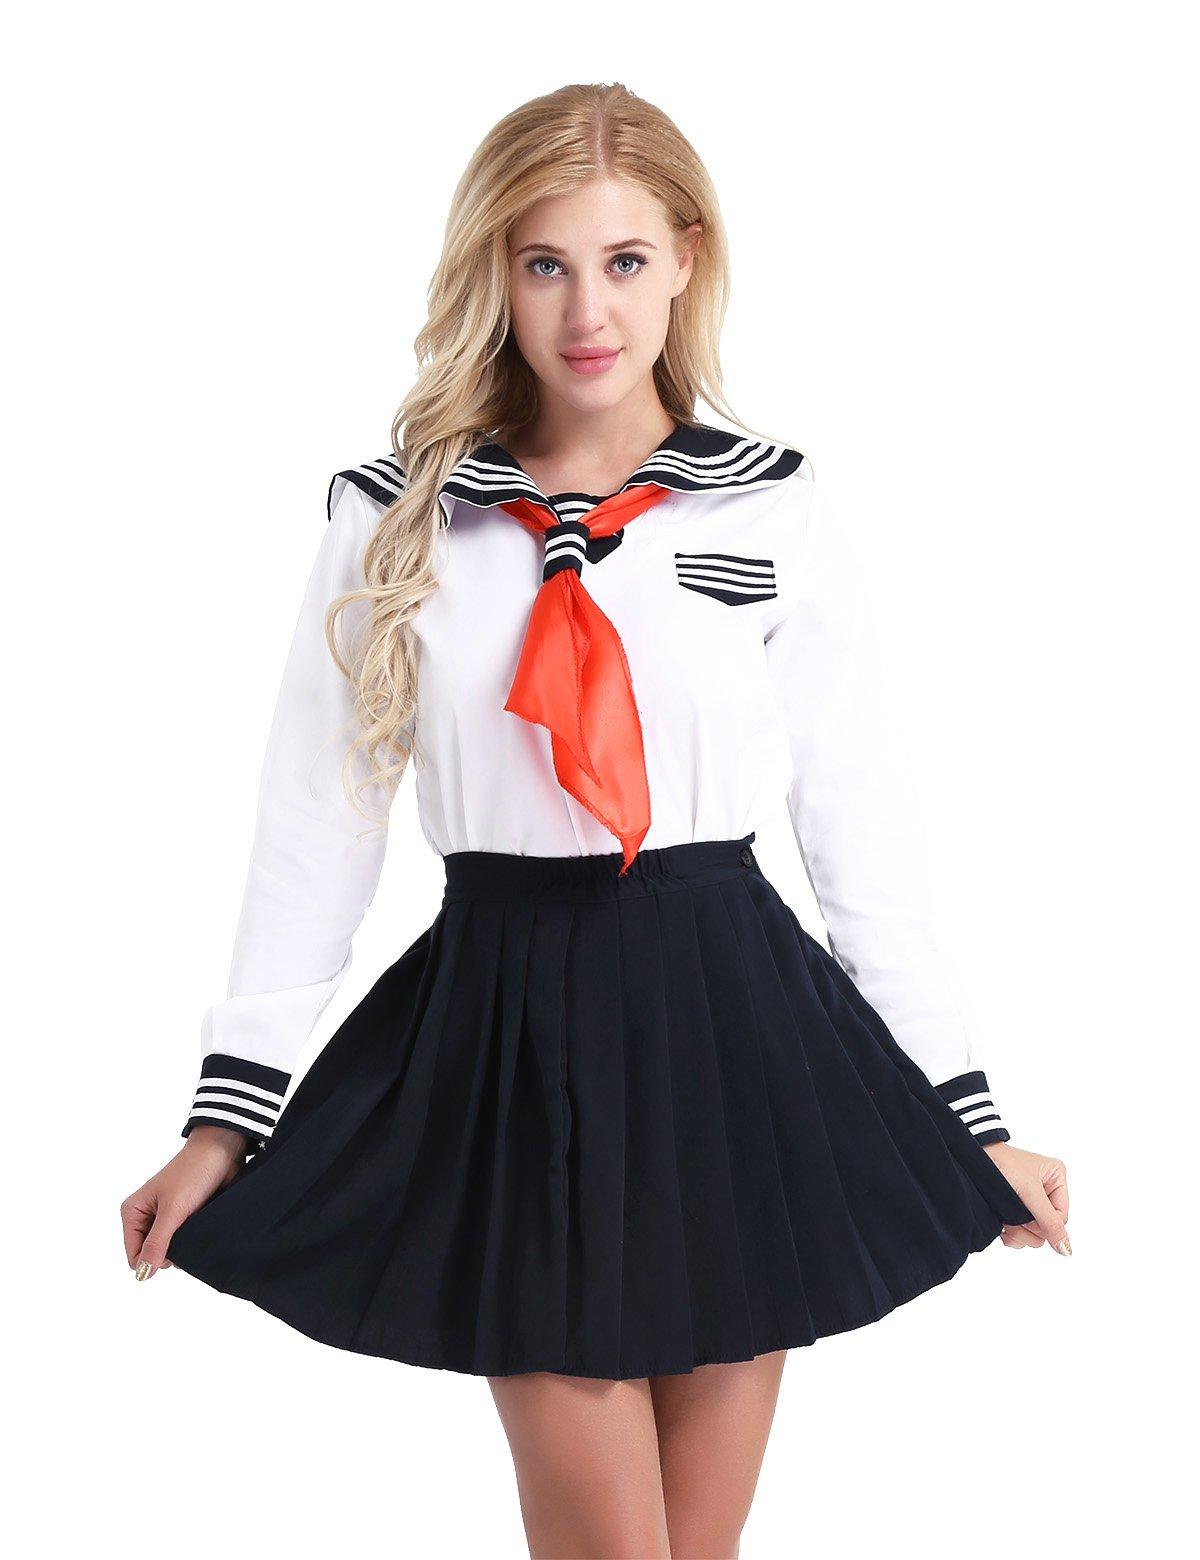 Agoky Womens' 3Pcs Long Sleeve Japanese Anime Cosplay Costume Lolita Sailor School Uniform Dress White XX-Large